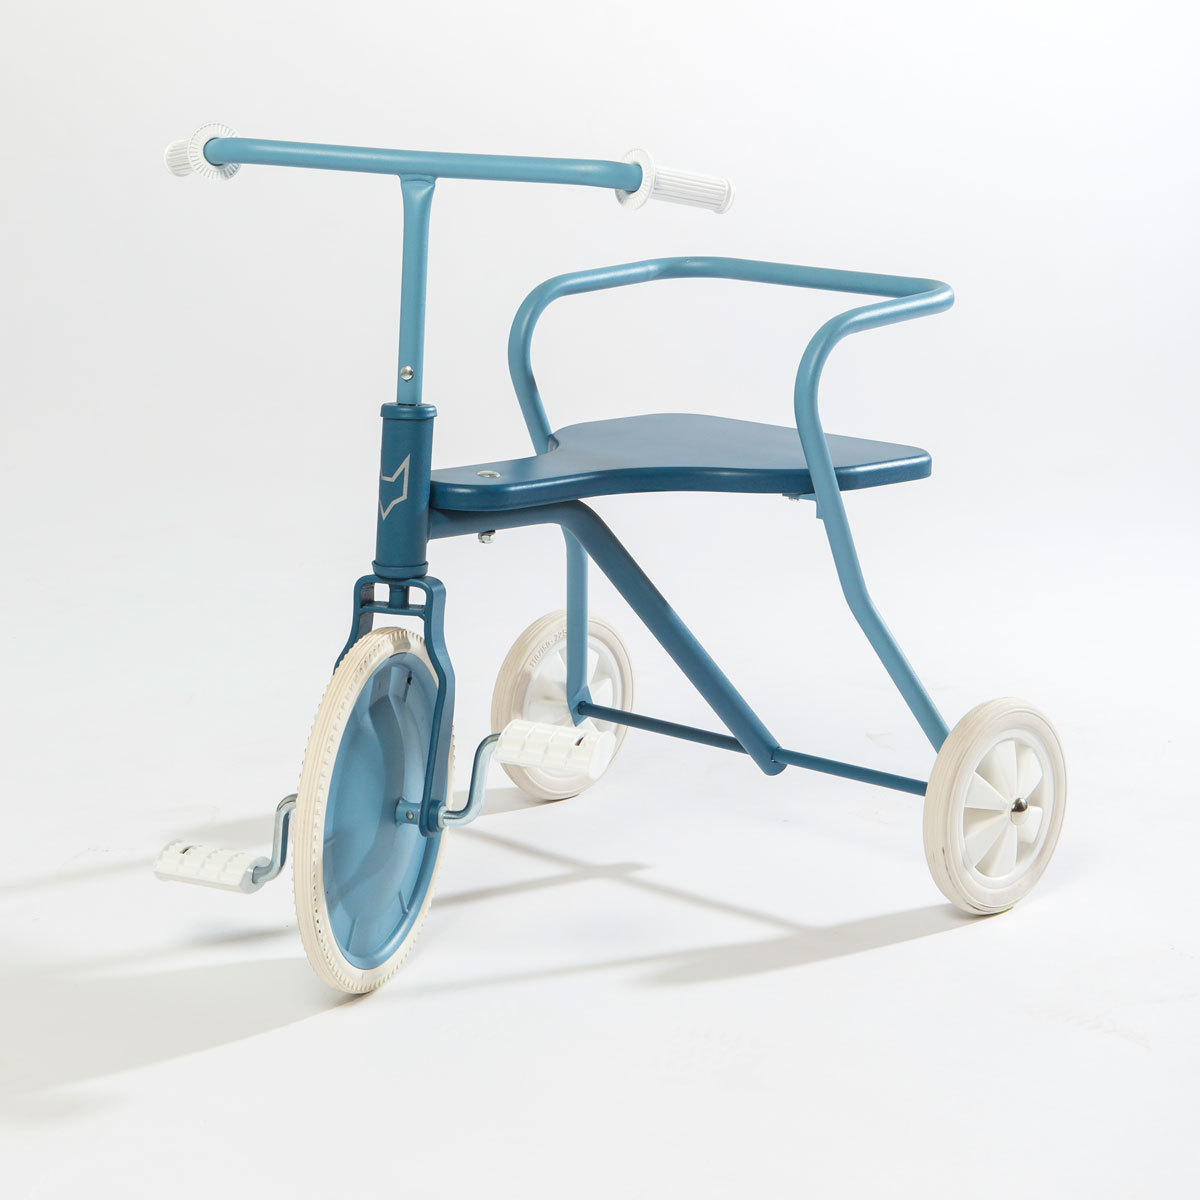 fox rider tricycle en m tal bleu vintage trotteur. Black Bedroom Furniture Sets. Home Design Ideas